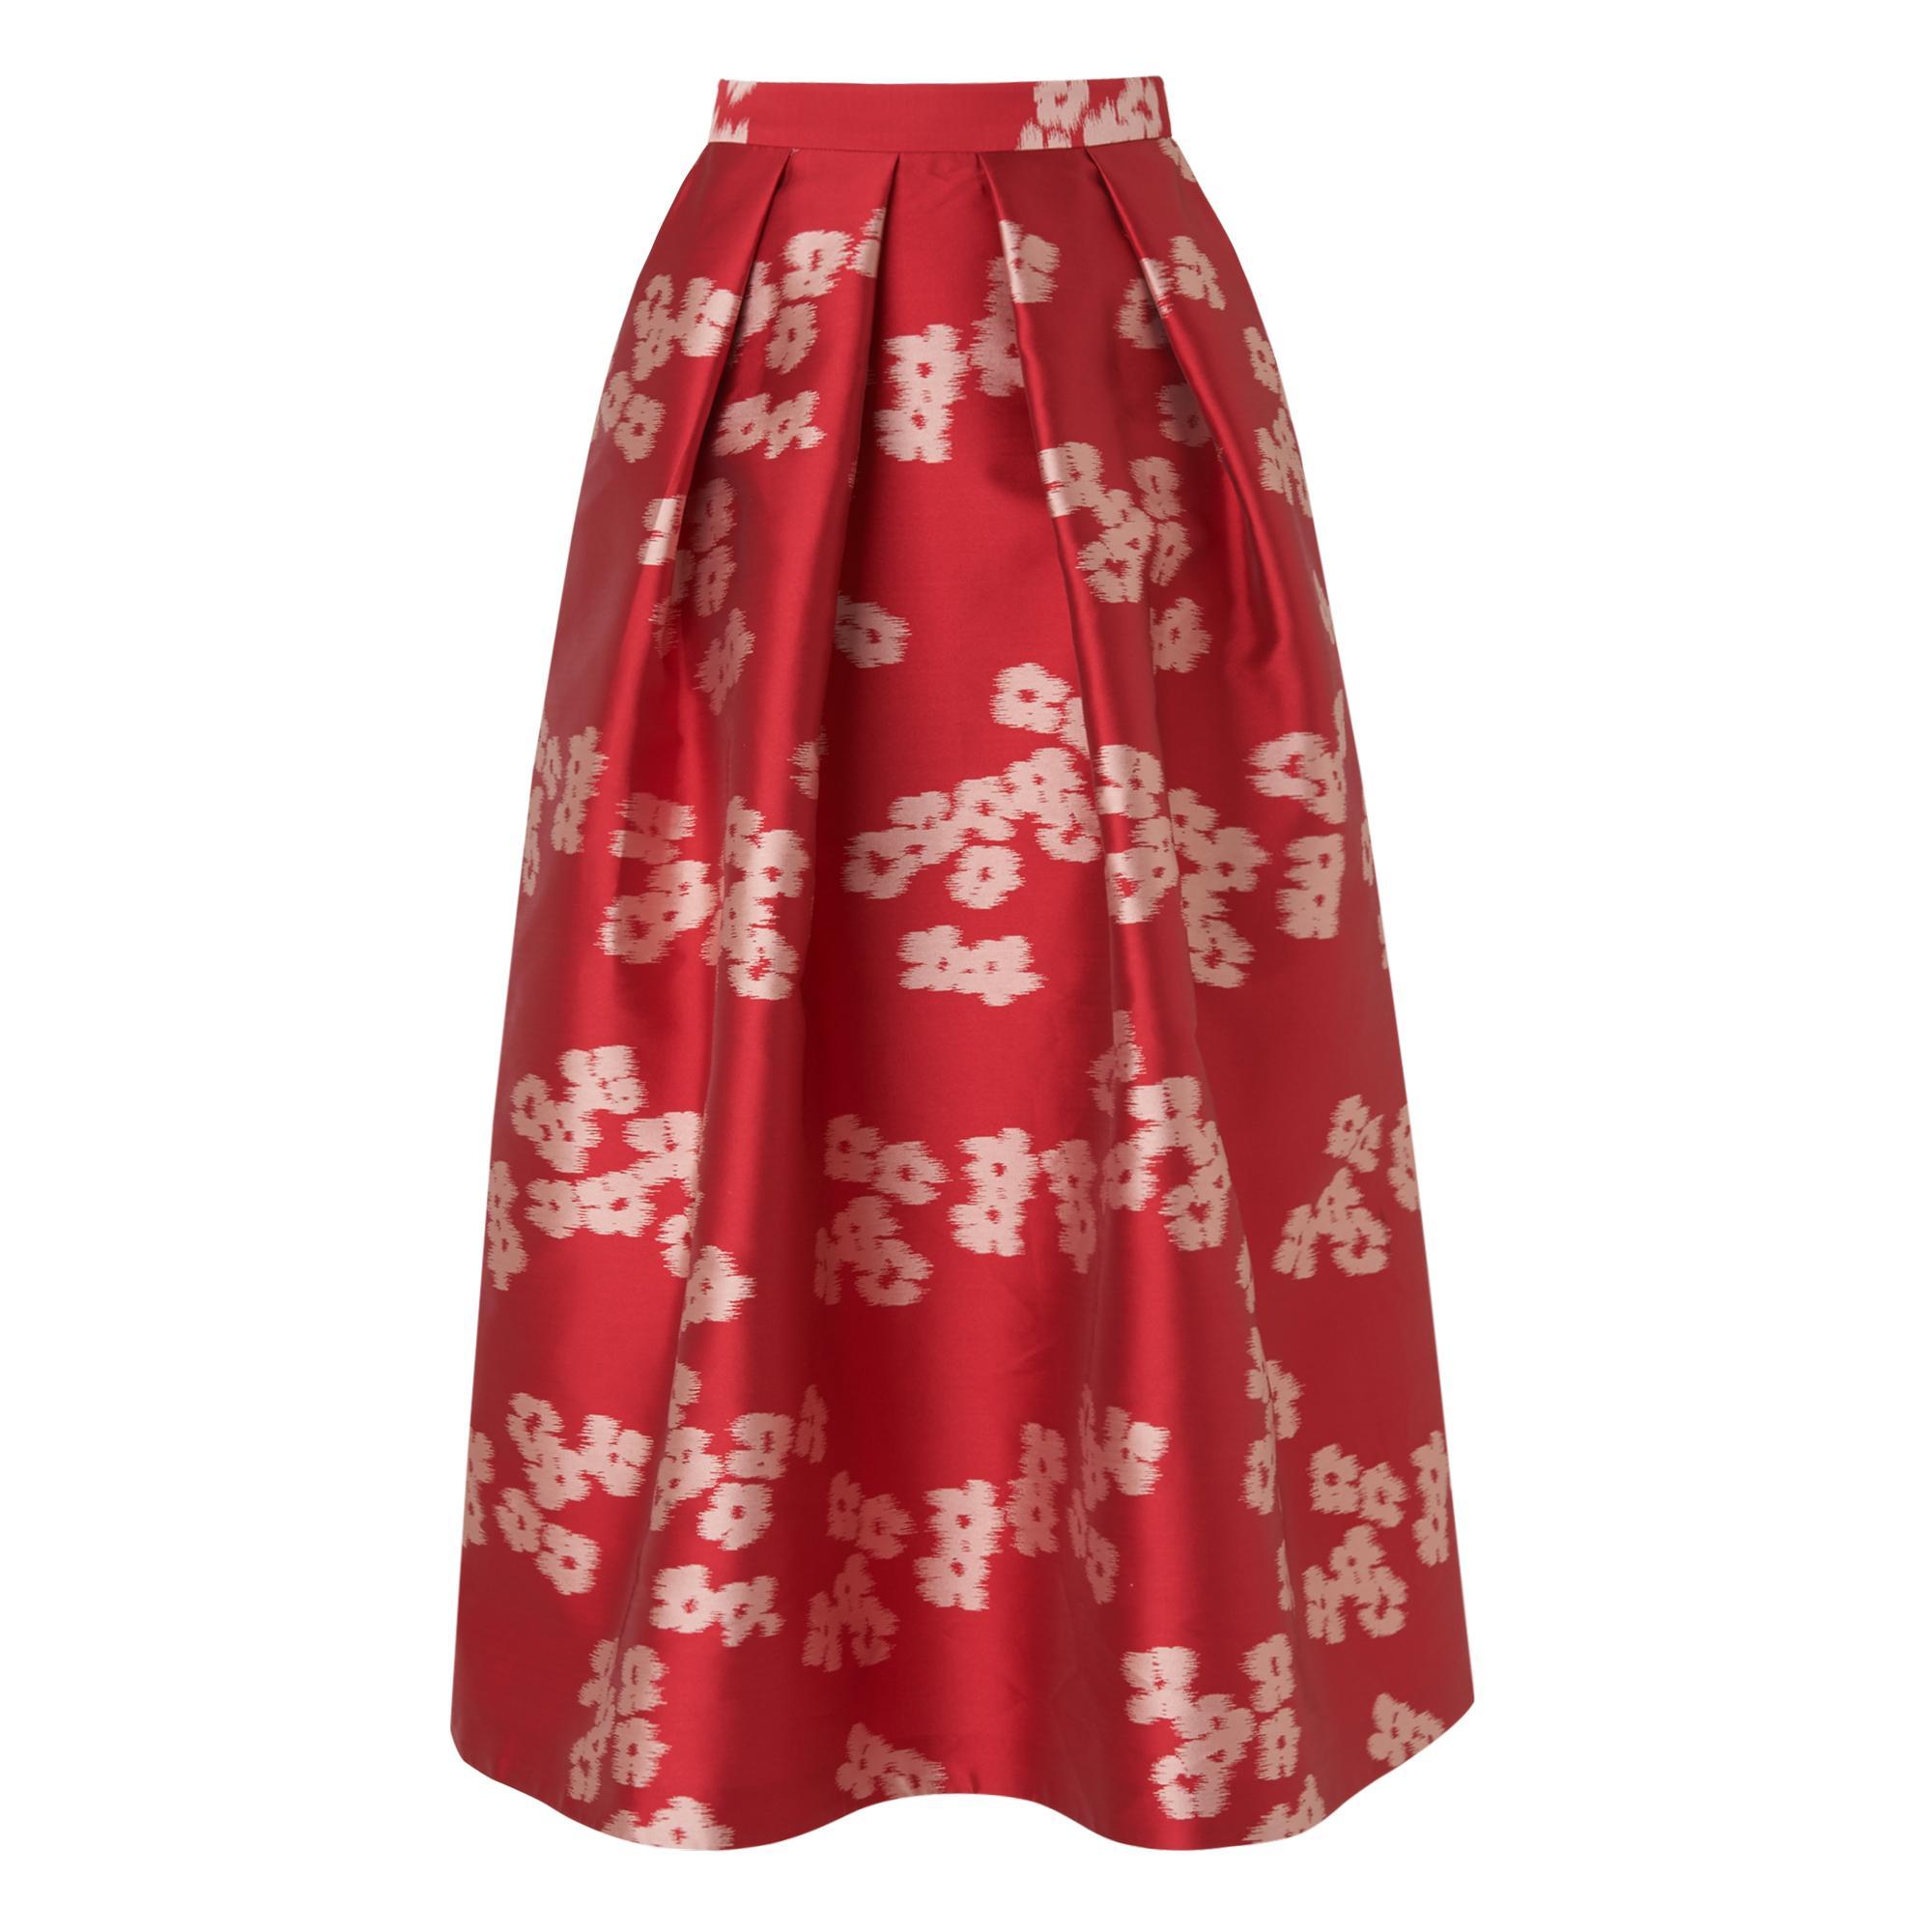 Sana Pink Floral Skirt